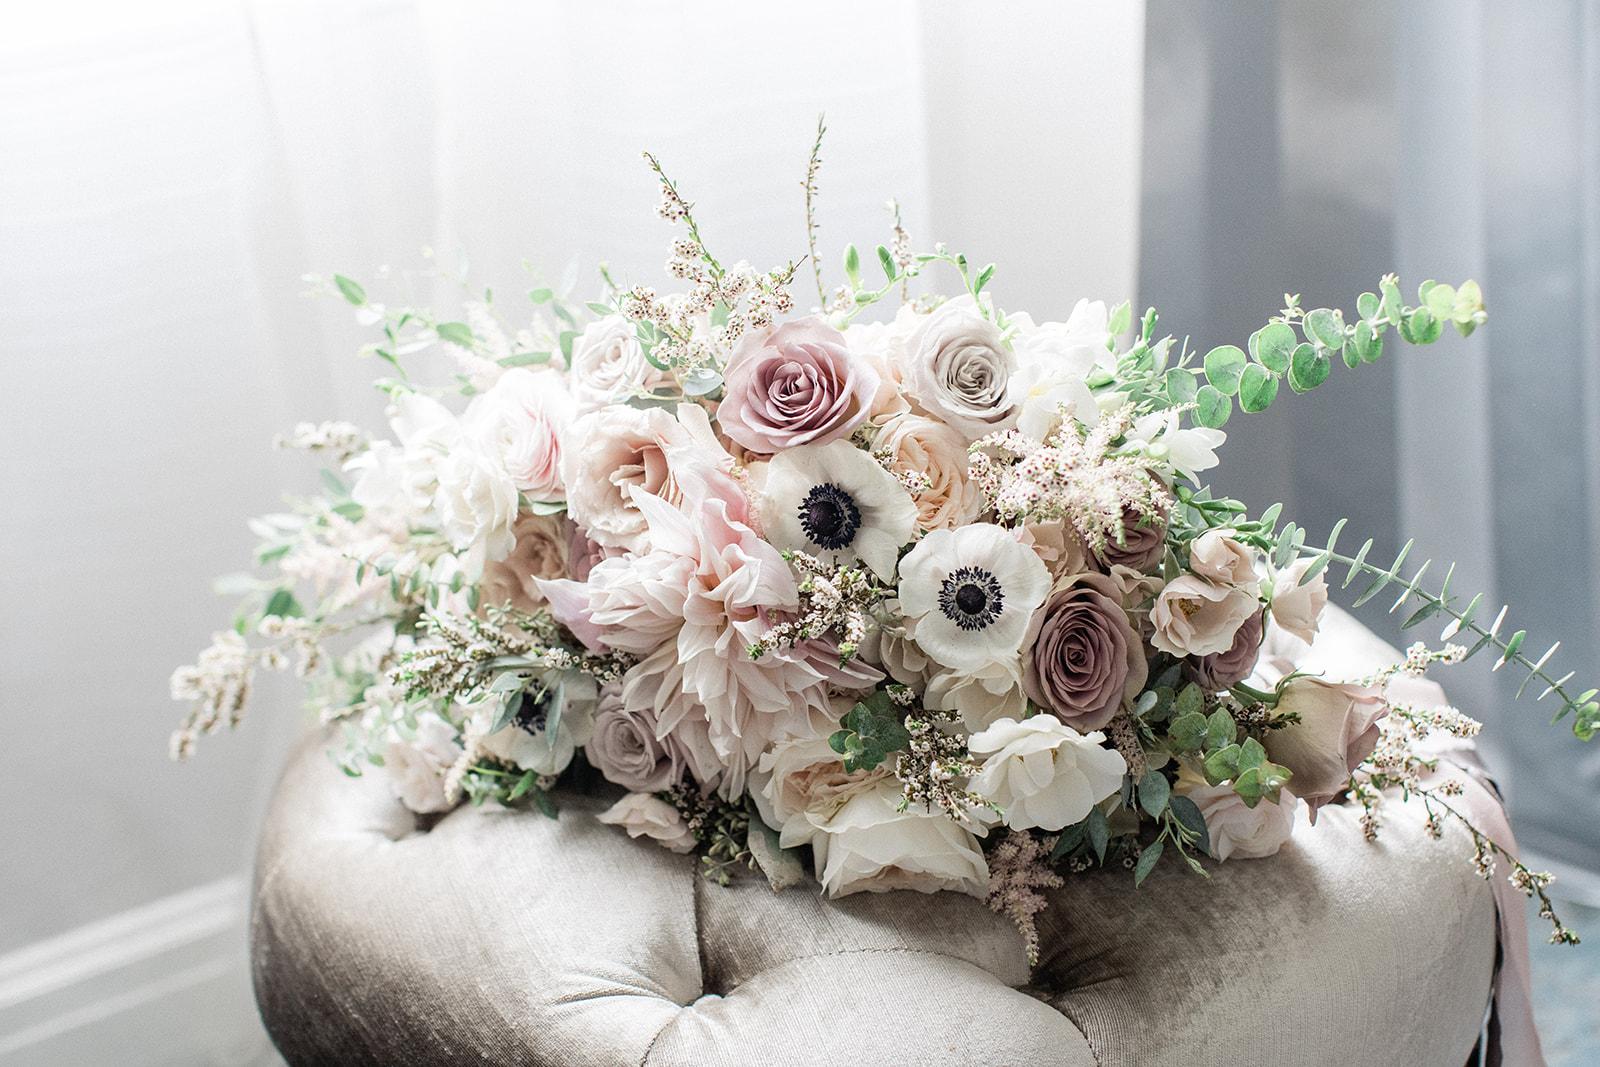 LisaCatherinePhotography_Jasmeen&Darren_Wedding-1305_websize.jpg